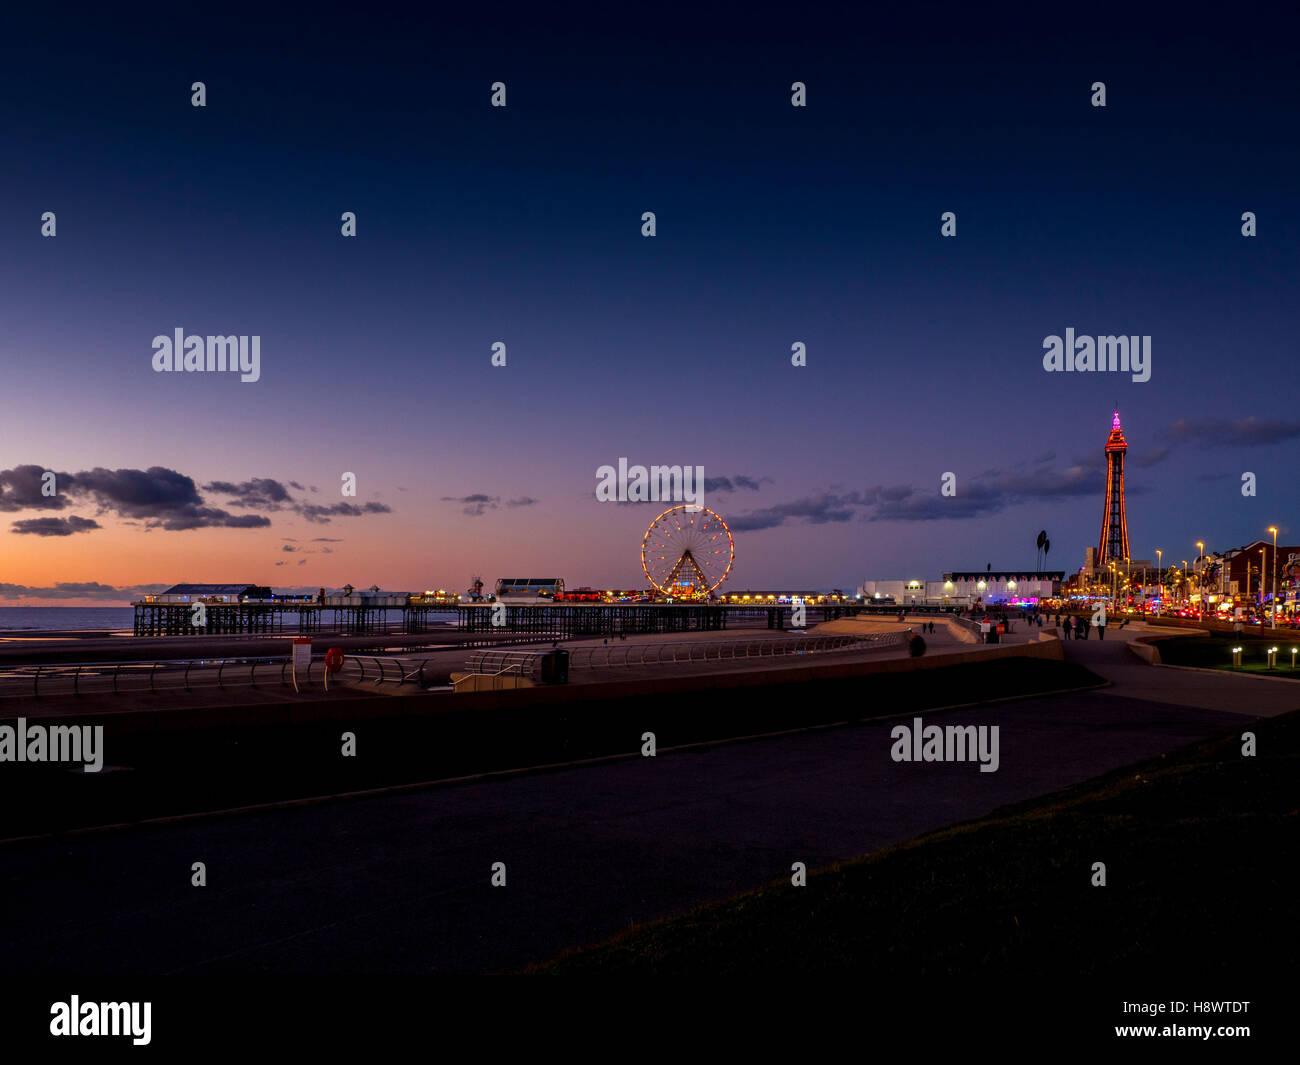 Blackpool Tower, Central Pier, Promenade and Illuminations, evening, Blackpool, Lancashire, UK. - Stock Image